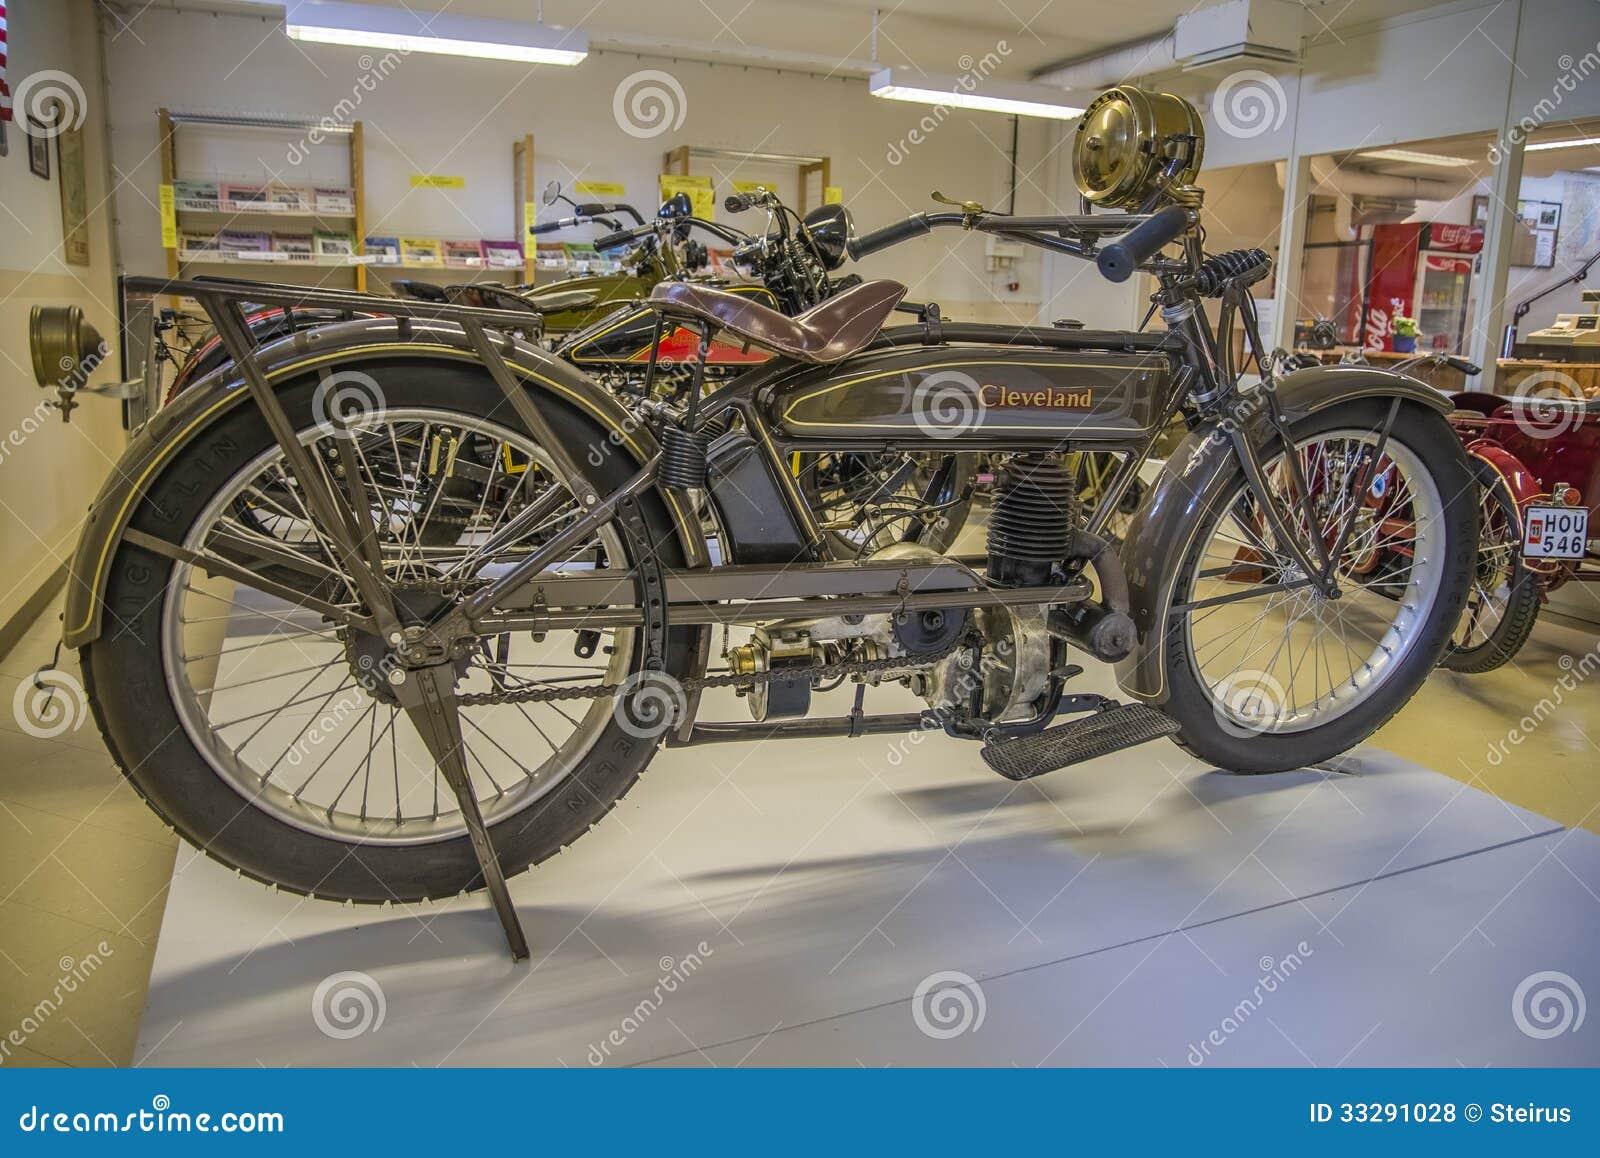 1919 cleveland usa editorial stock photo image of for Usa motors cleveland ohio